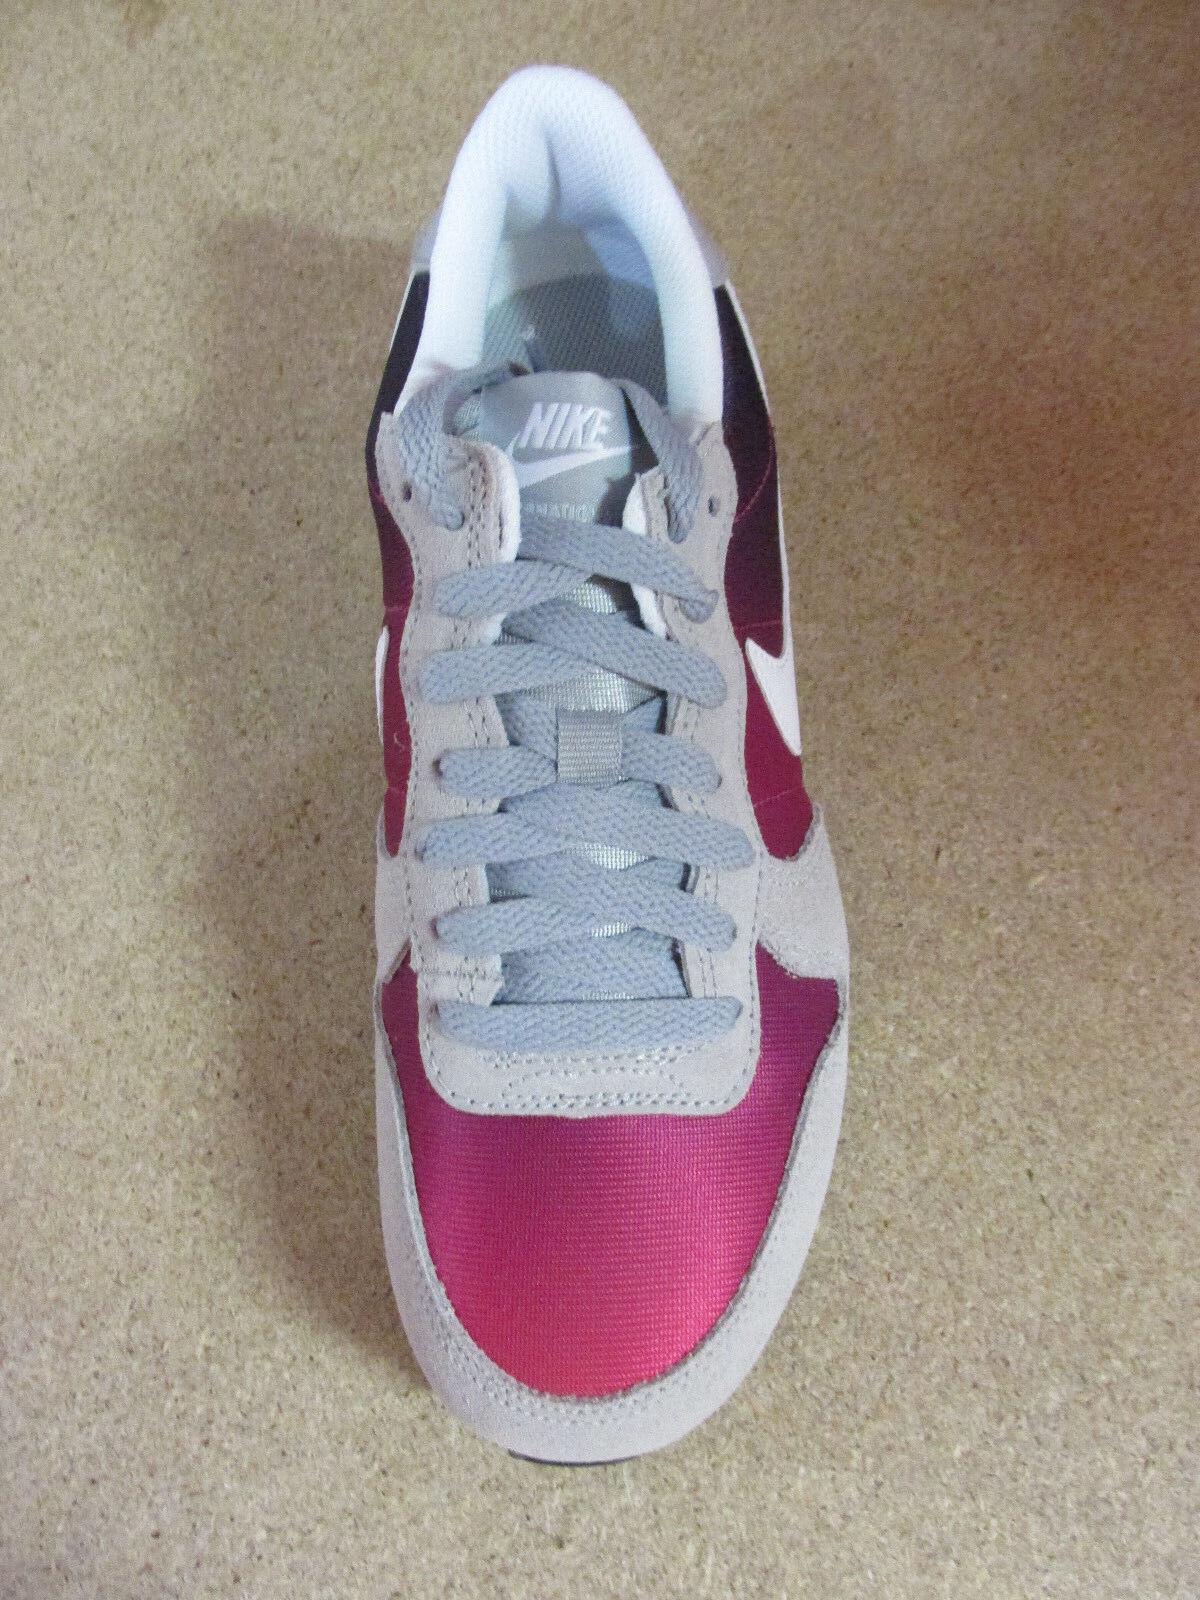 nike internationaliste (gs) formateurs formateurs (gs) 814435 015 chaussures chaussures c8646b